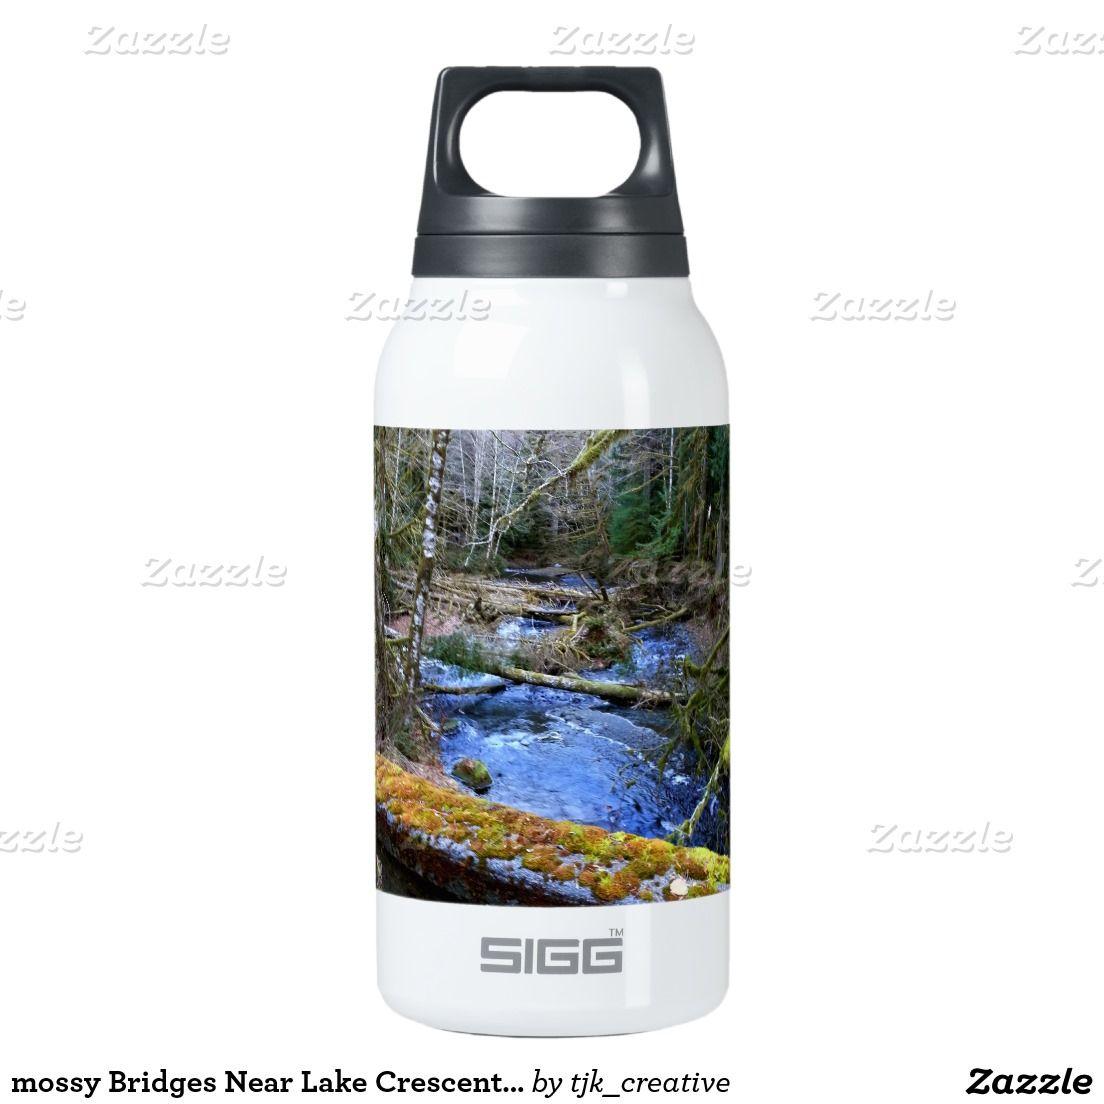 mossy Bridges Near Lake Crescent Lodge Insulated Water Bottle